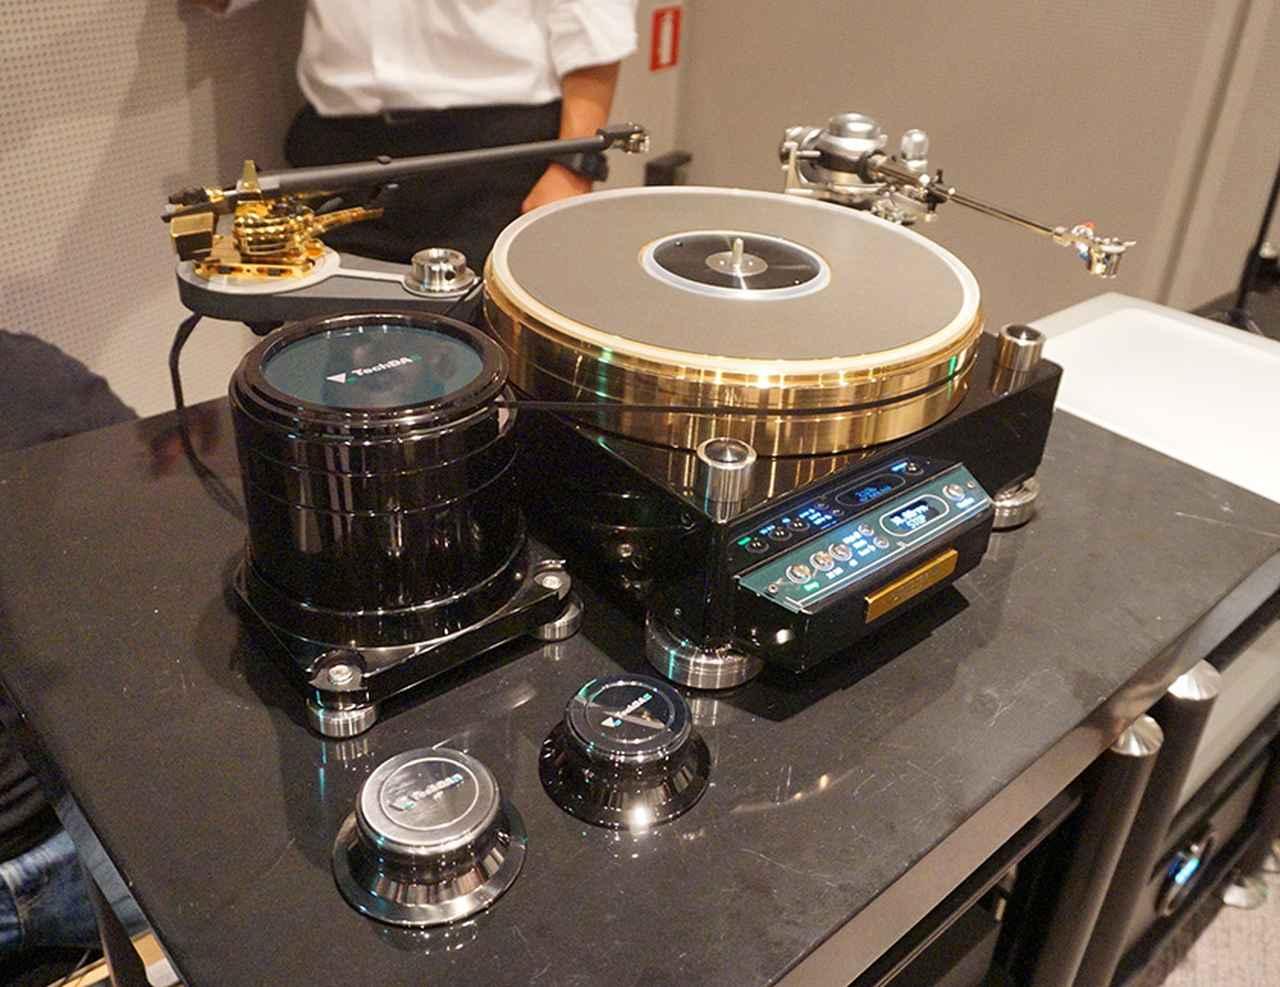 Images : 7番目の画像 - 「VIVID audio、新スピーカー「KAYA」シリーズ発売。CEOも来日した発表会の詳細をレポート」のアルバム - Stereo Sound ONLINE